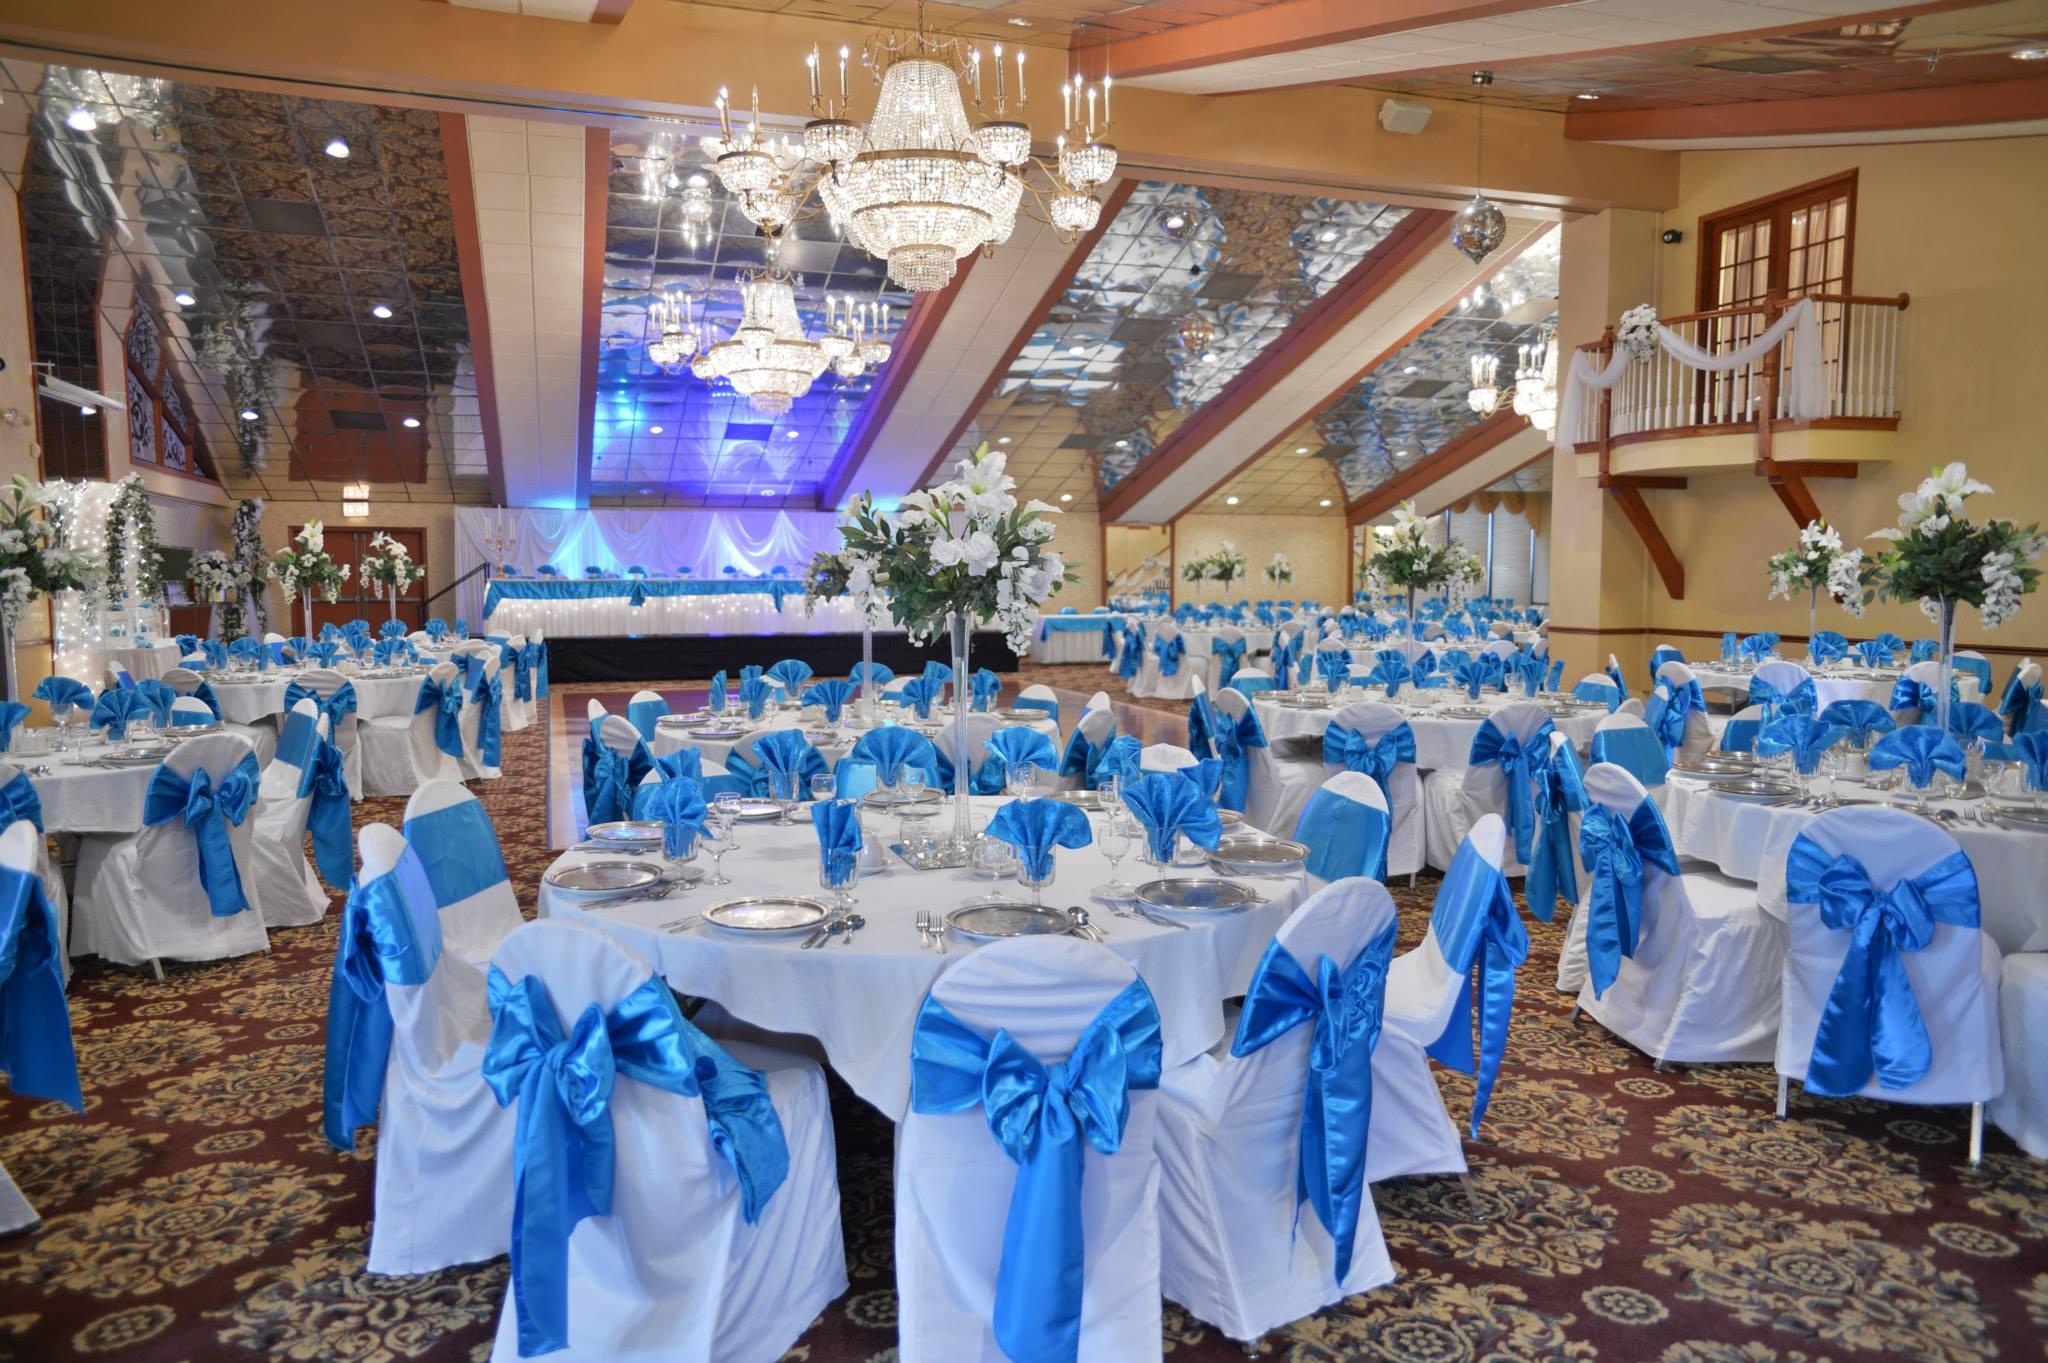 Martinique Banquet Hall Chicago